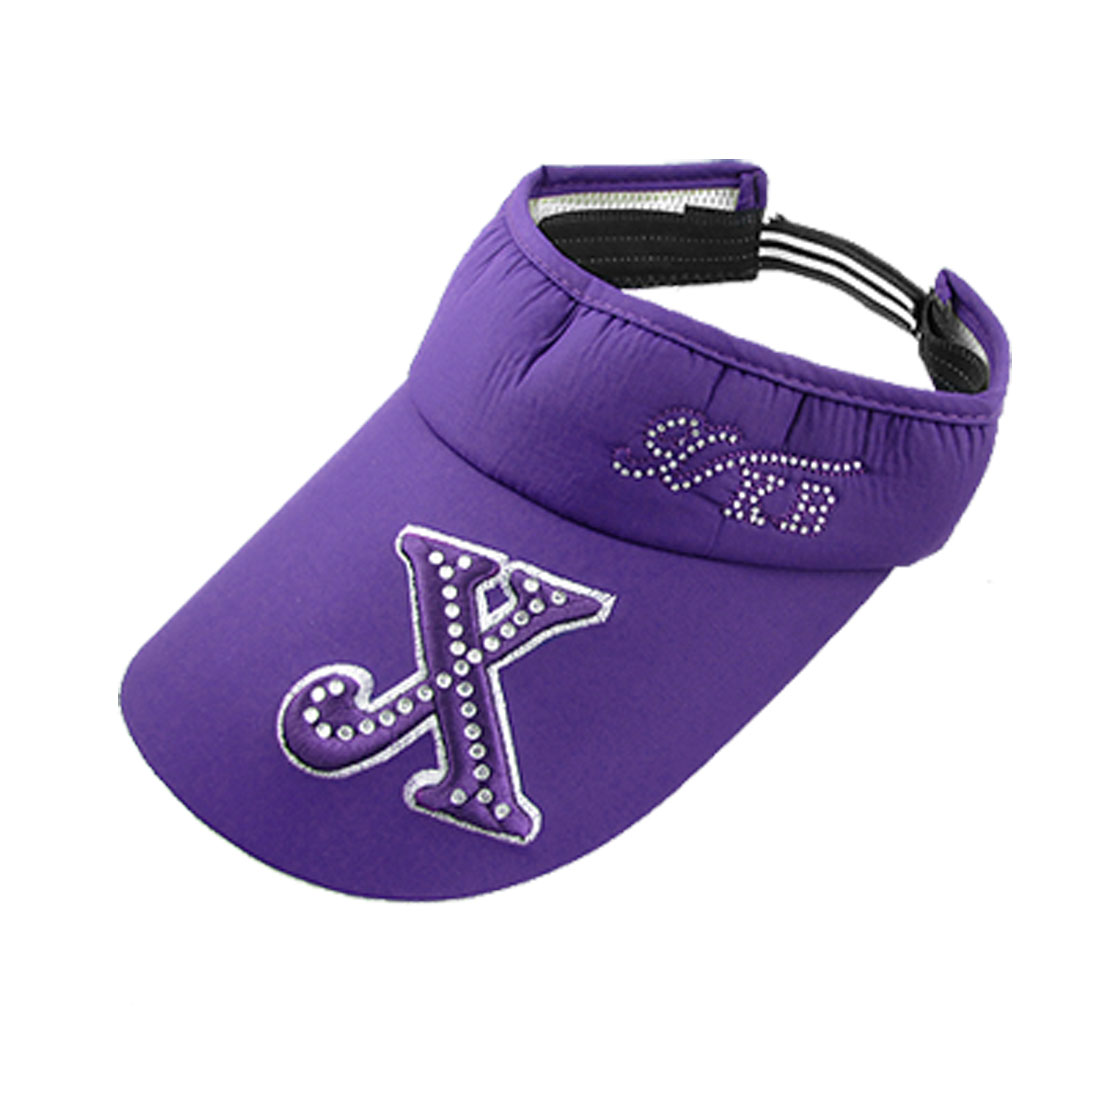 Ladies Rhinestone Embroidered X Sports Sun Visor Hat Cap Purple